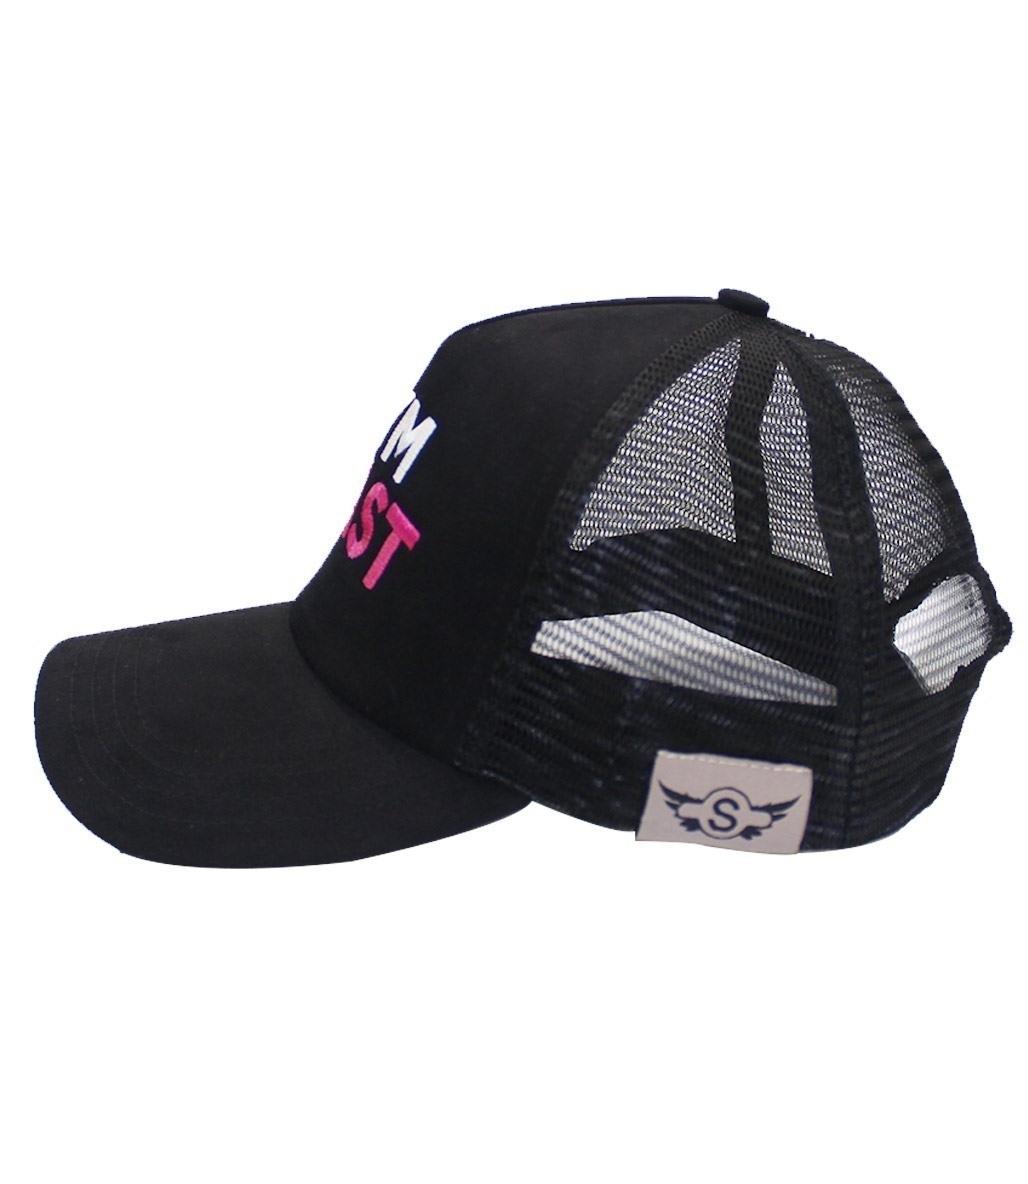 Supplementler Gym Beast Fileli Şapka Siyah Pembe Yazı